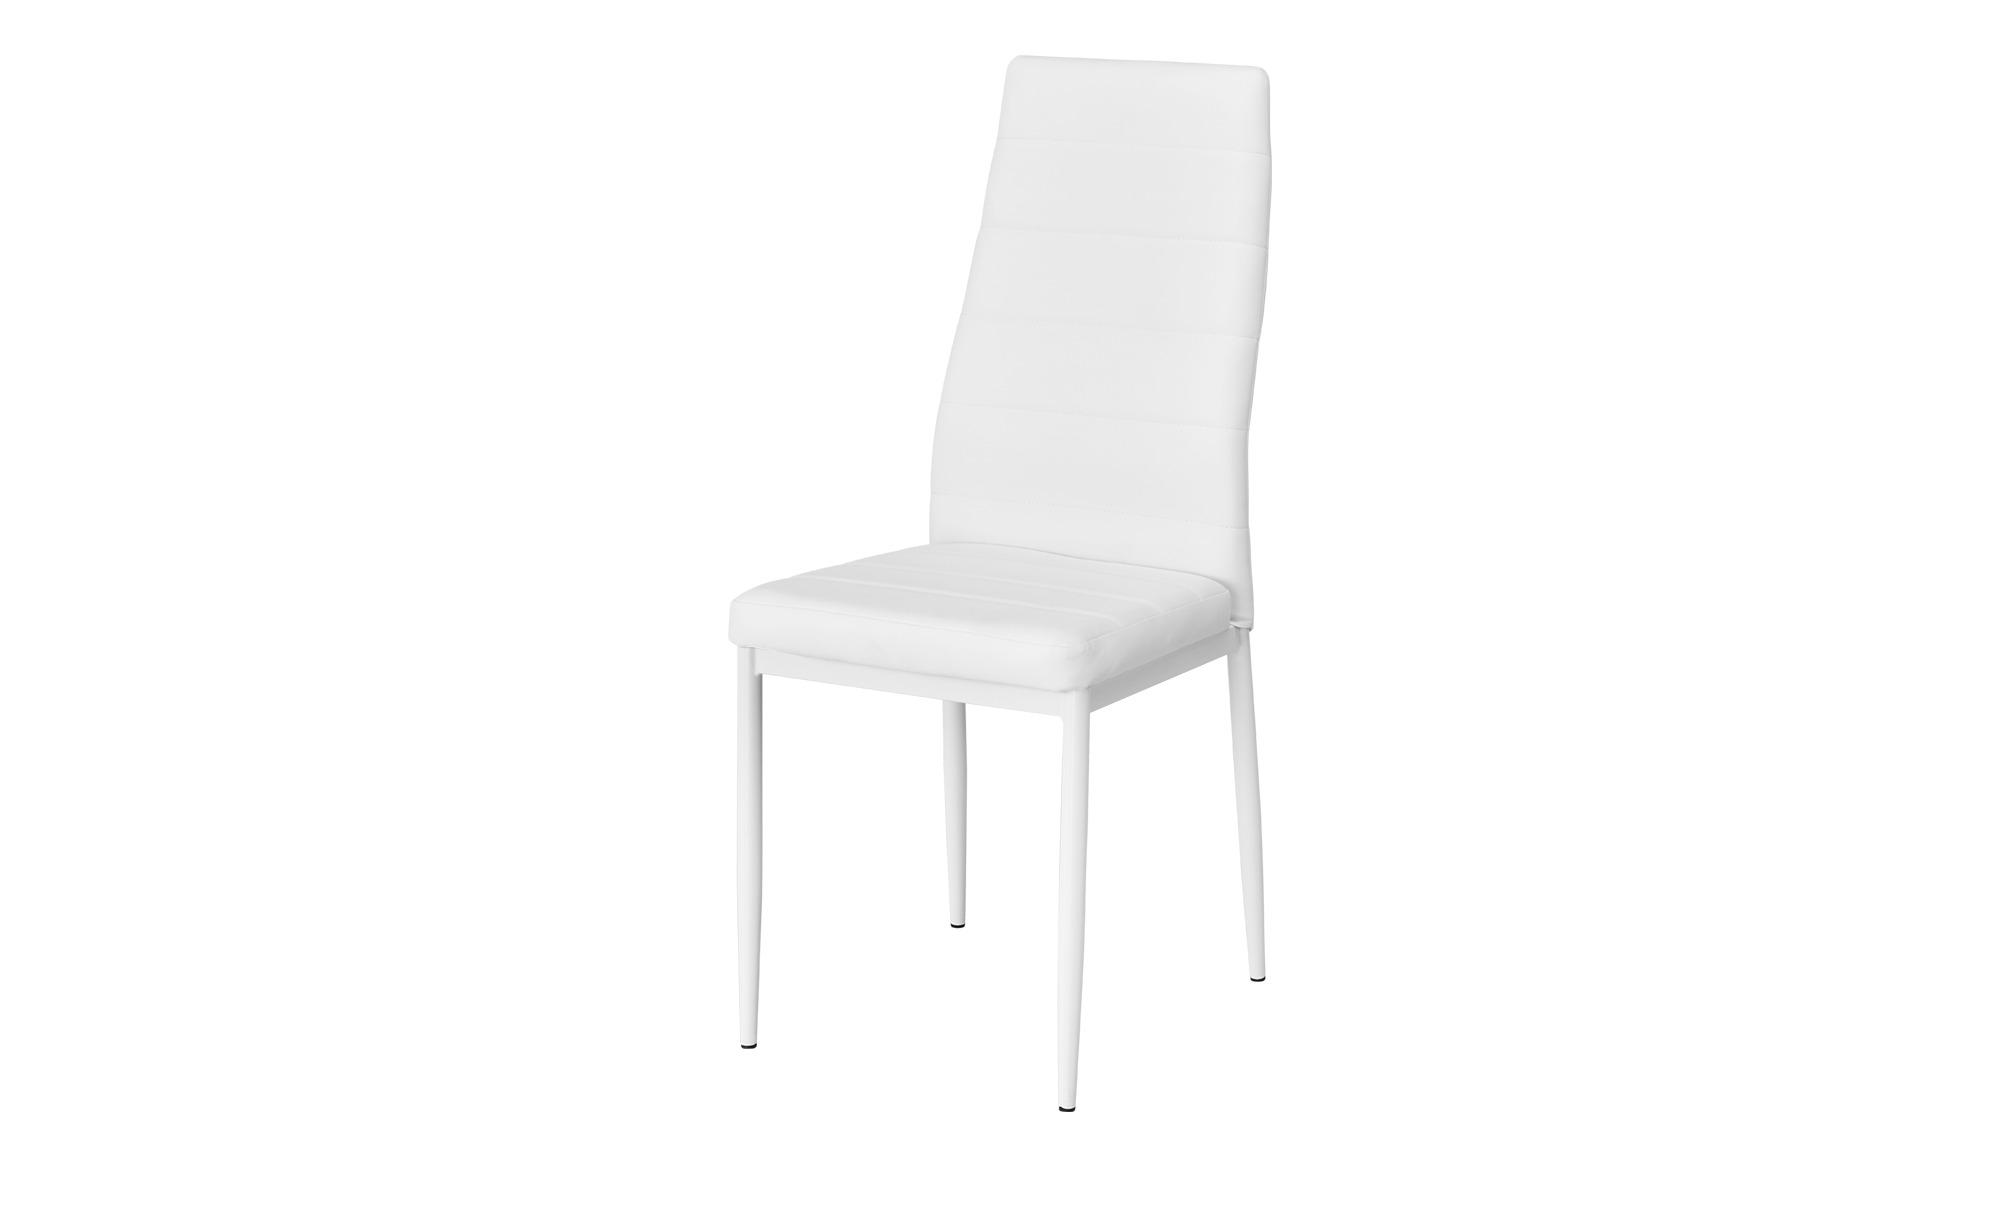 Stuhl Nick ¦ weiß ¦ Maße (cm): B: 40 H: 98 T: 50,5 Stühle ...